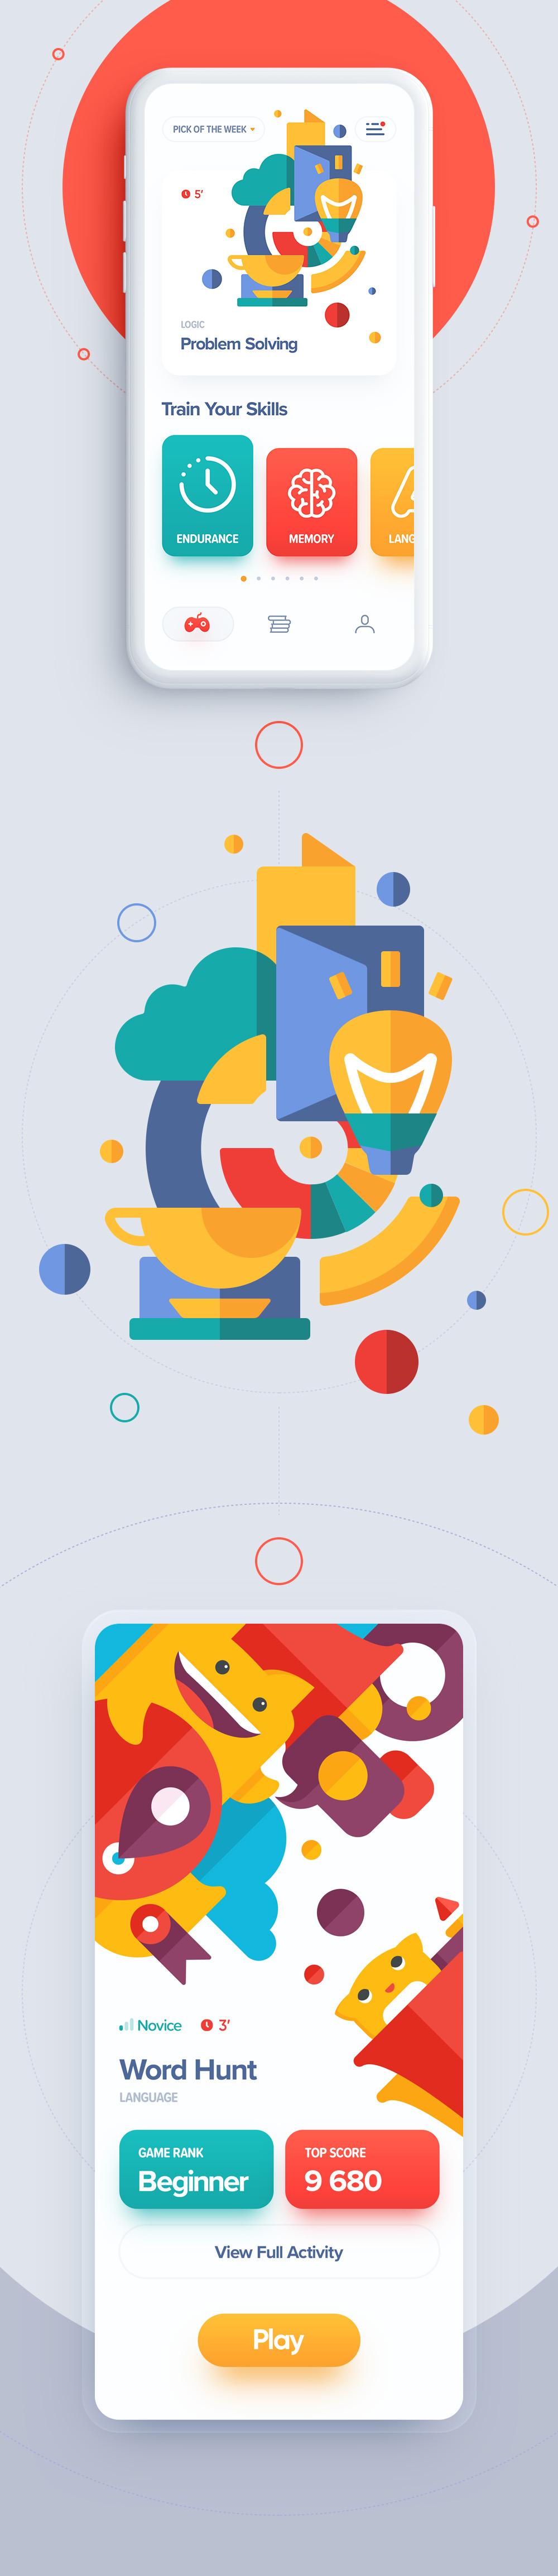 Ios game app design flat animation illustration